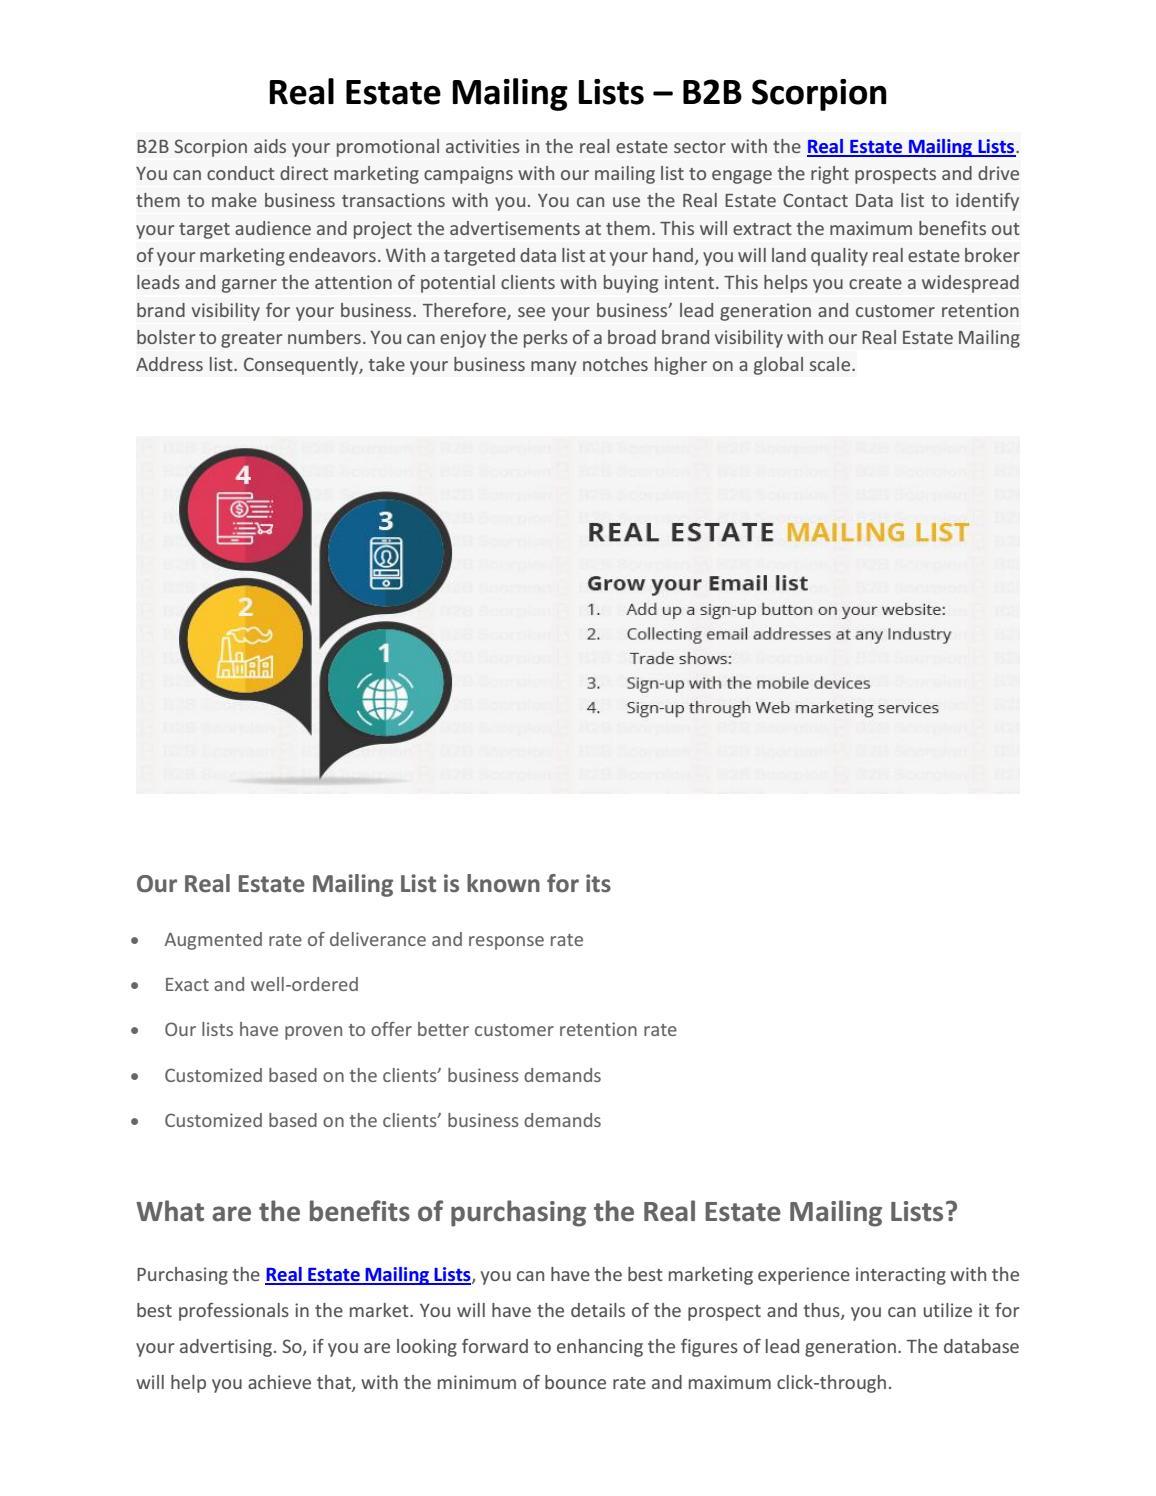 Real estate mailing lists   b2b scorpion by B2B Scorpion - issuu